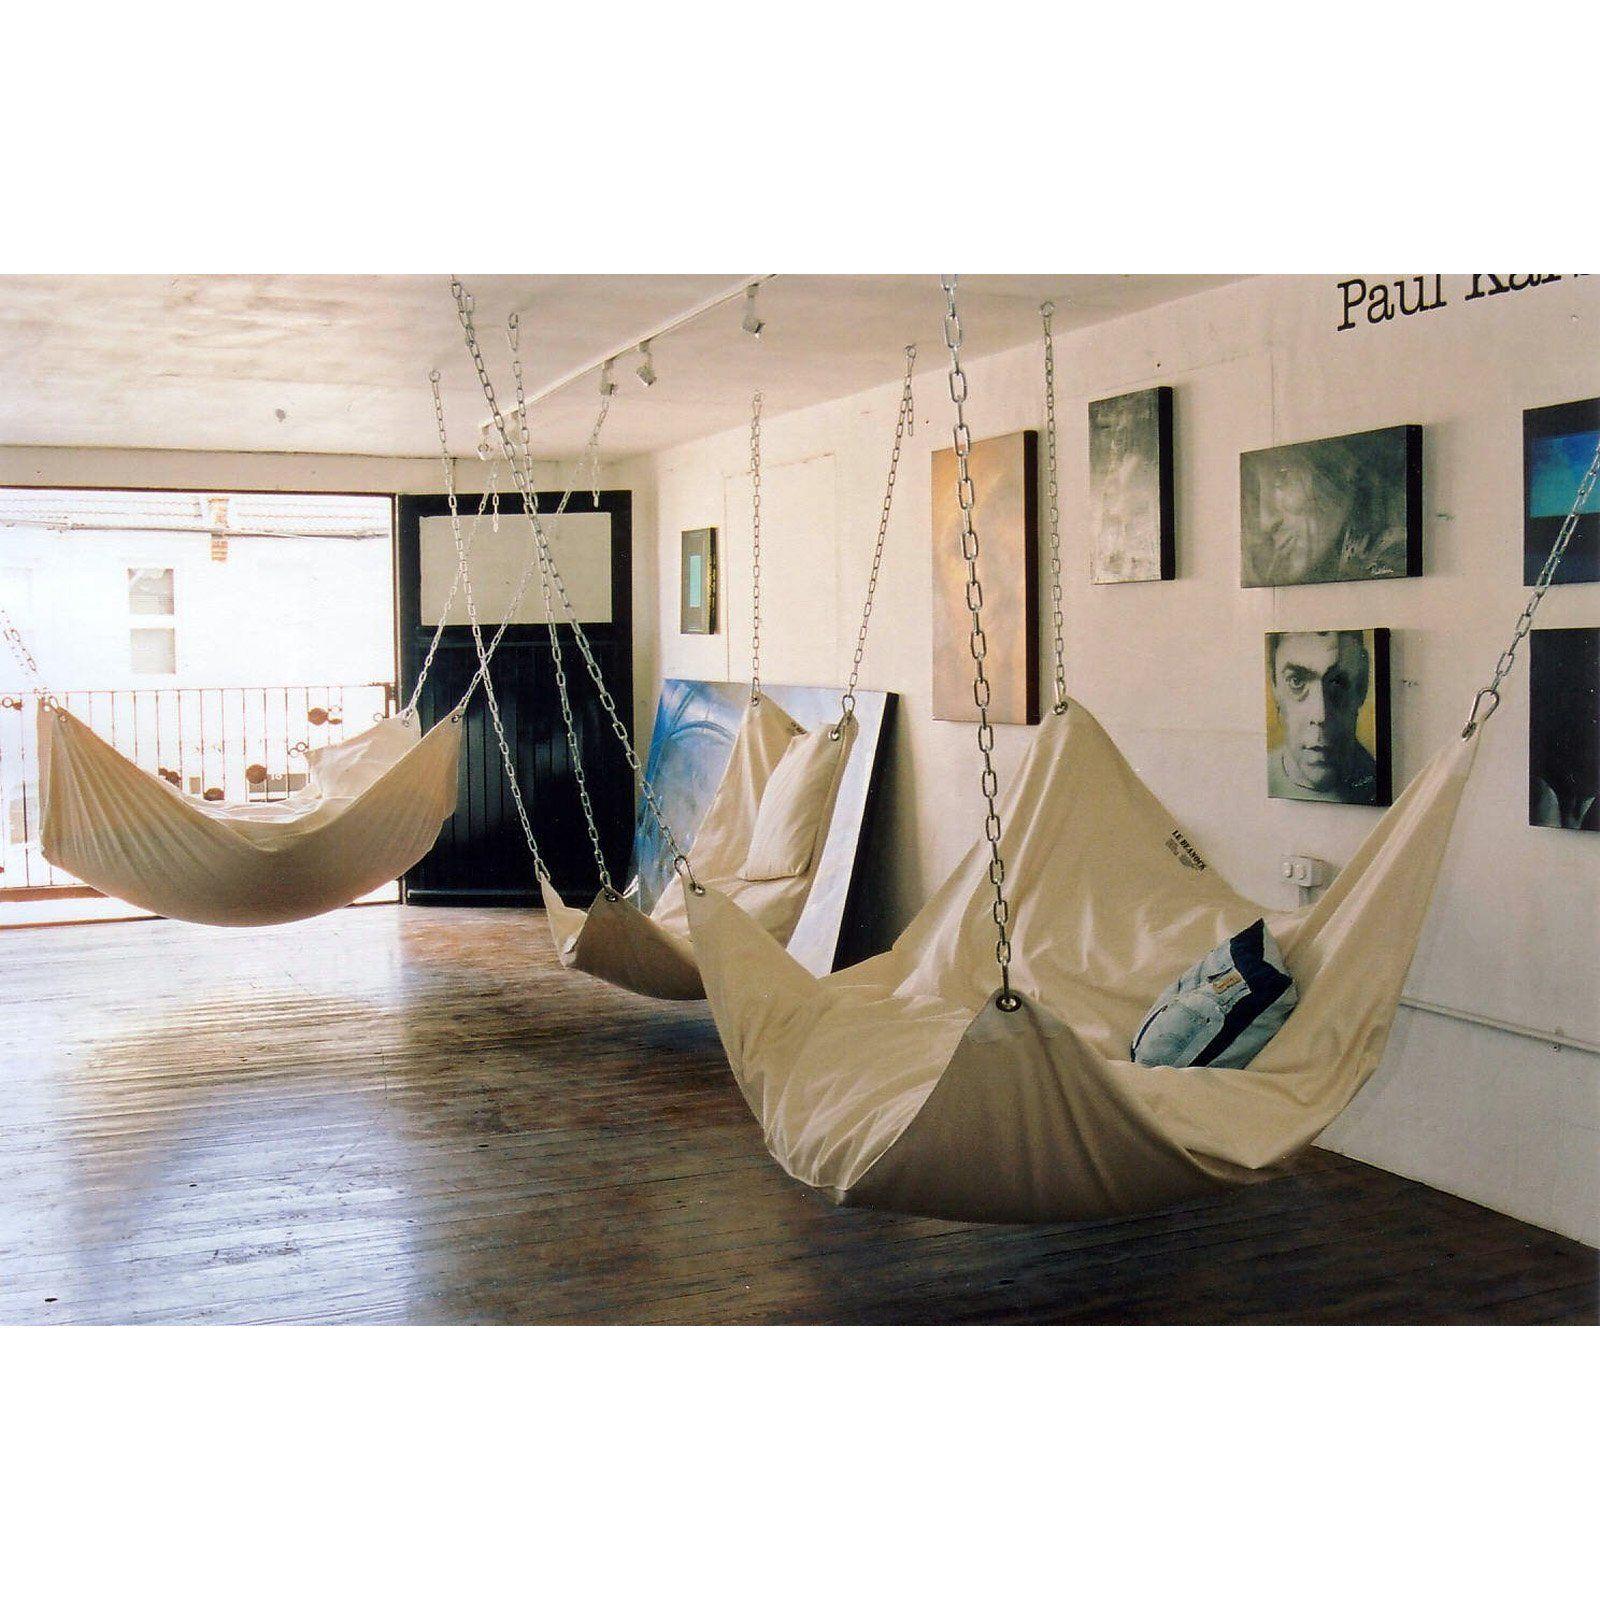 le beanock indoor hammock  I LOVE this  Lookie the